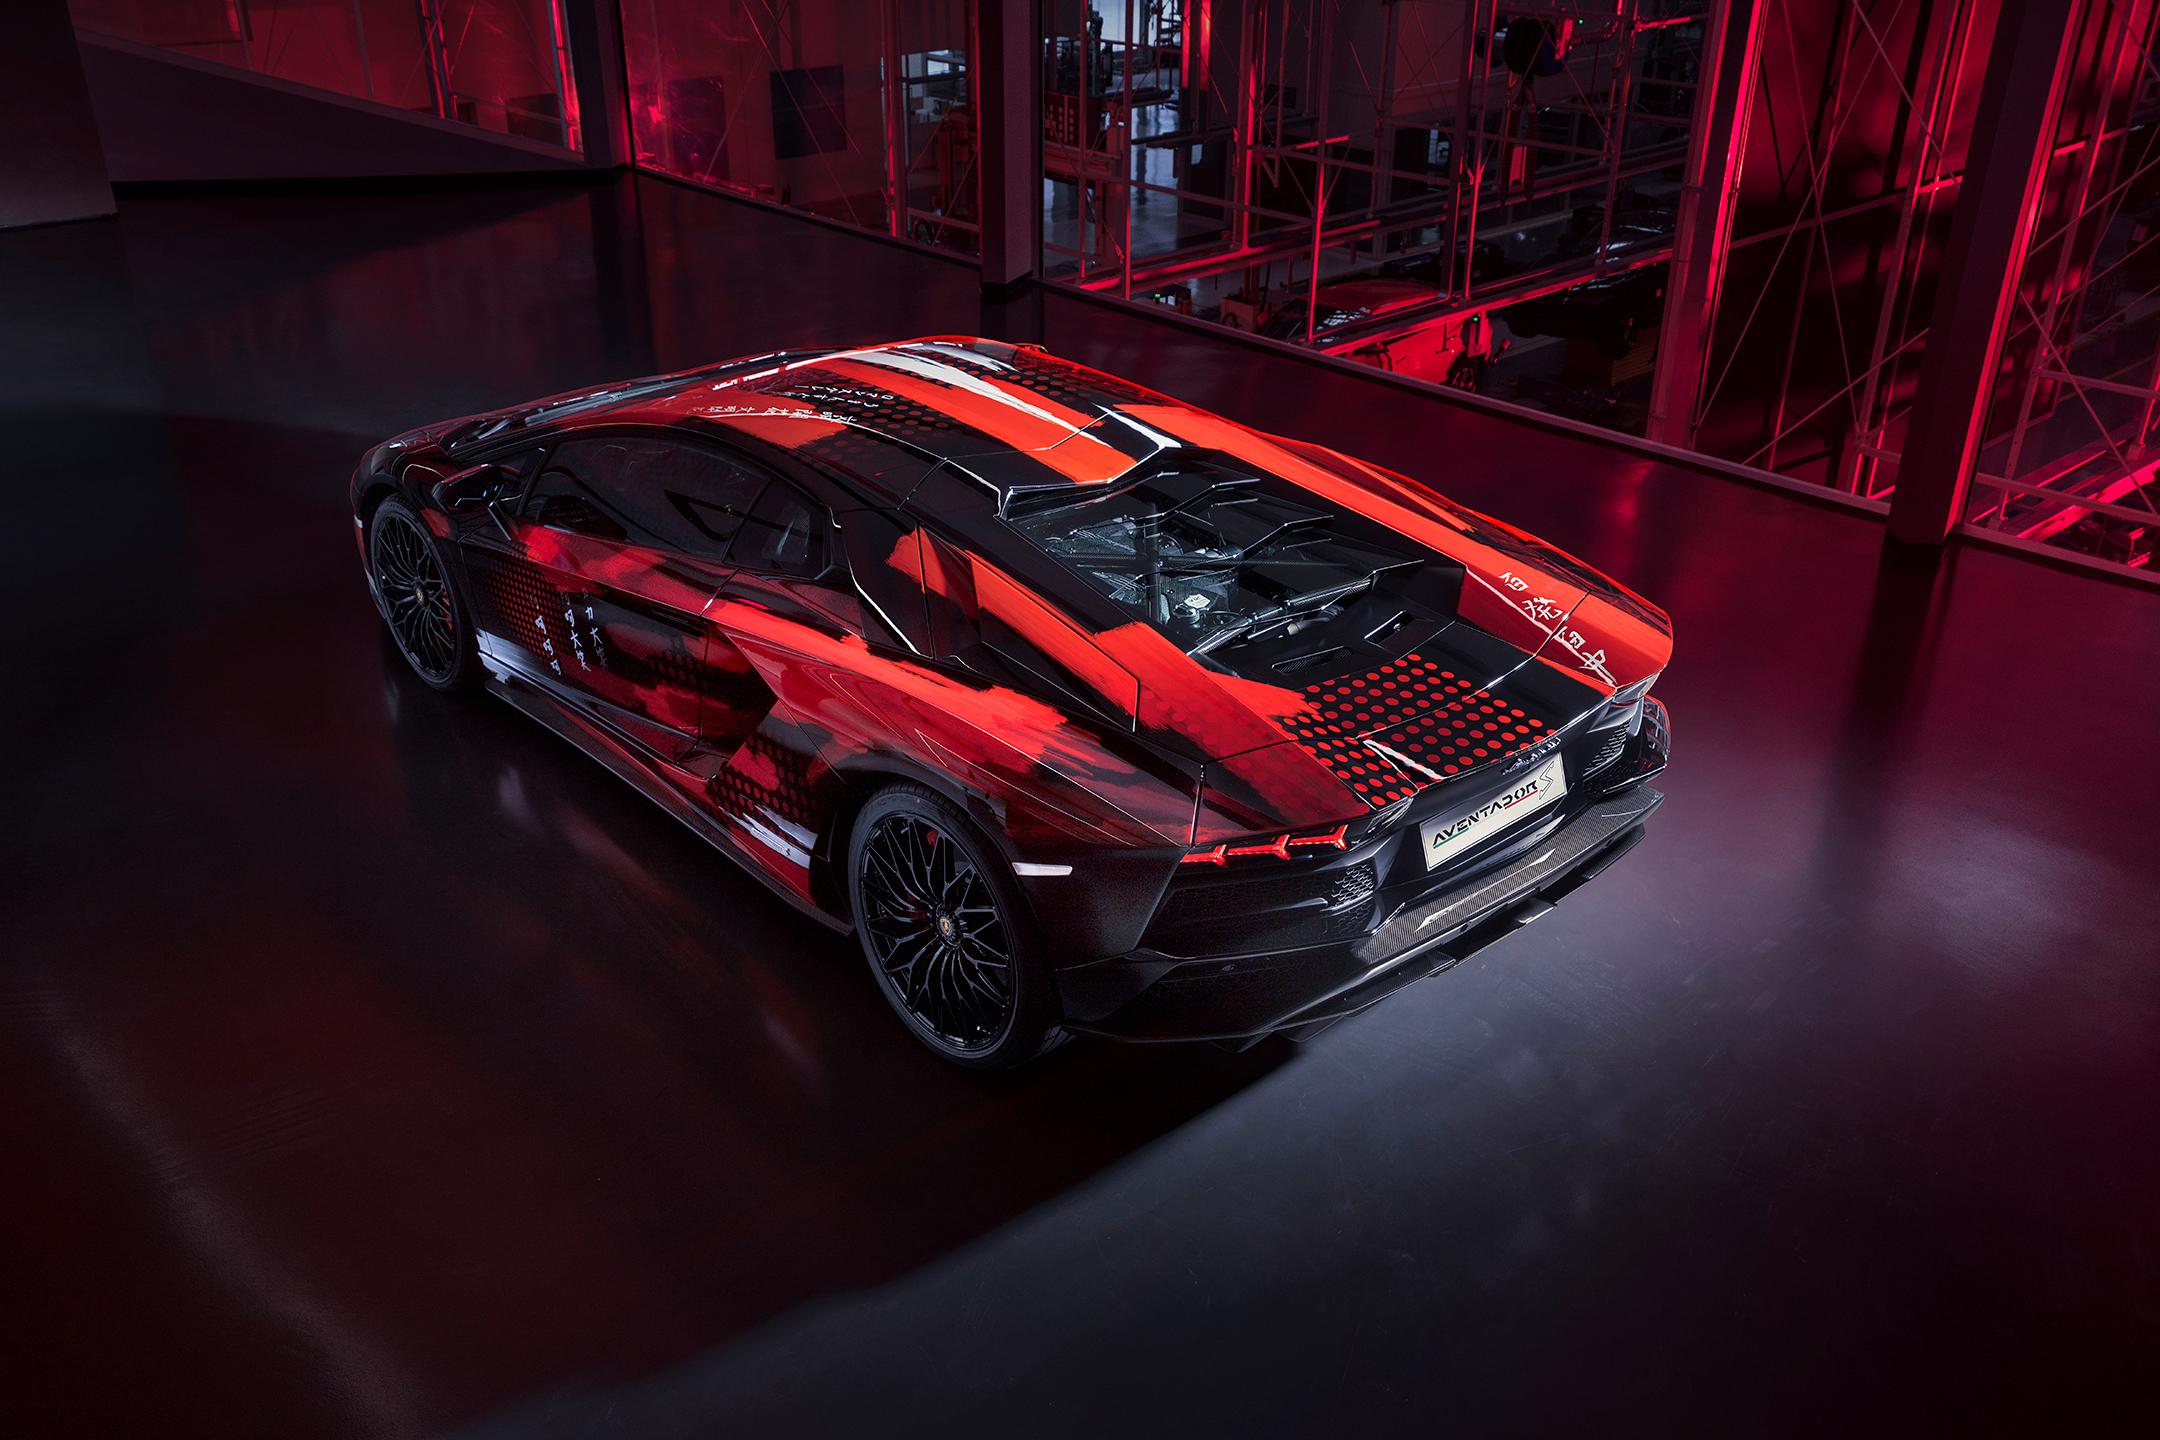 Lamborghini Aventador S x Yohji Yamamoto fashion designer - 2020 - top view - rear side-face / profil arrière